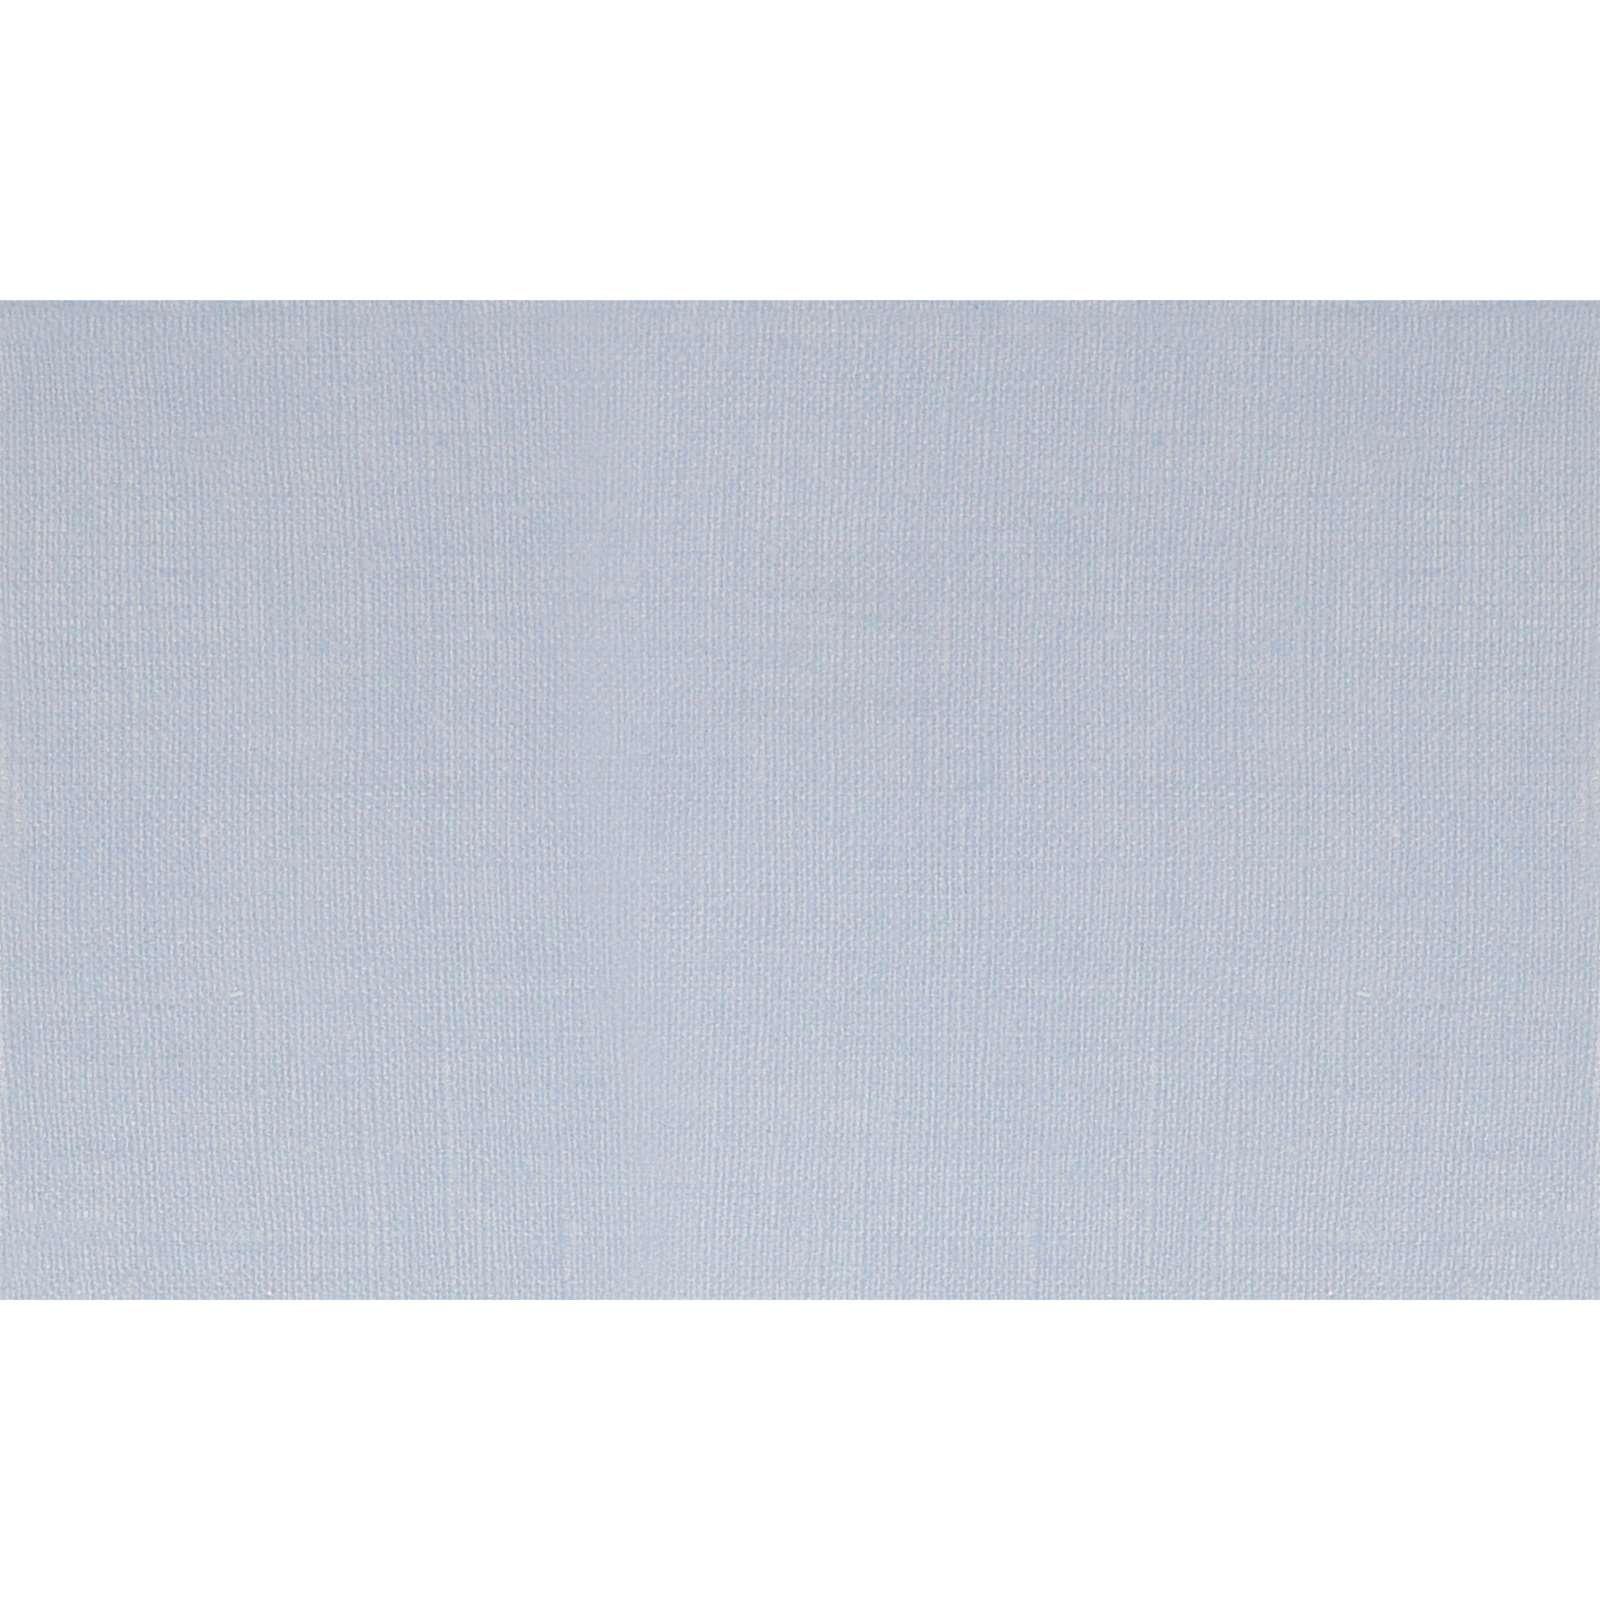 Плитка обл. 250х400мм Мадейра гол верх 01, Unitile